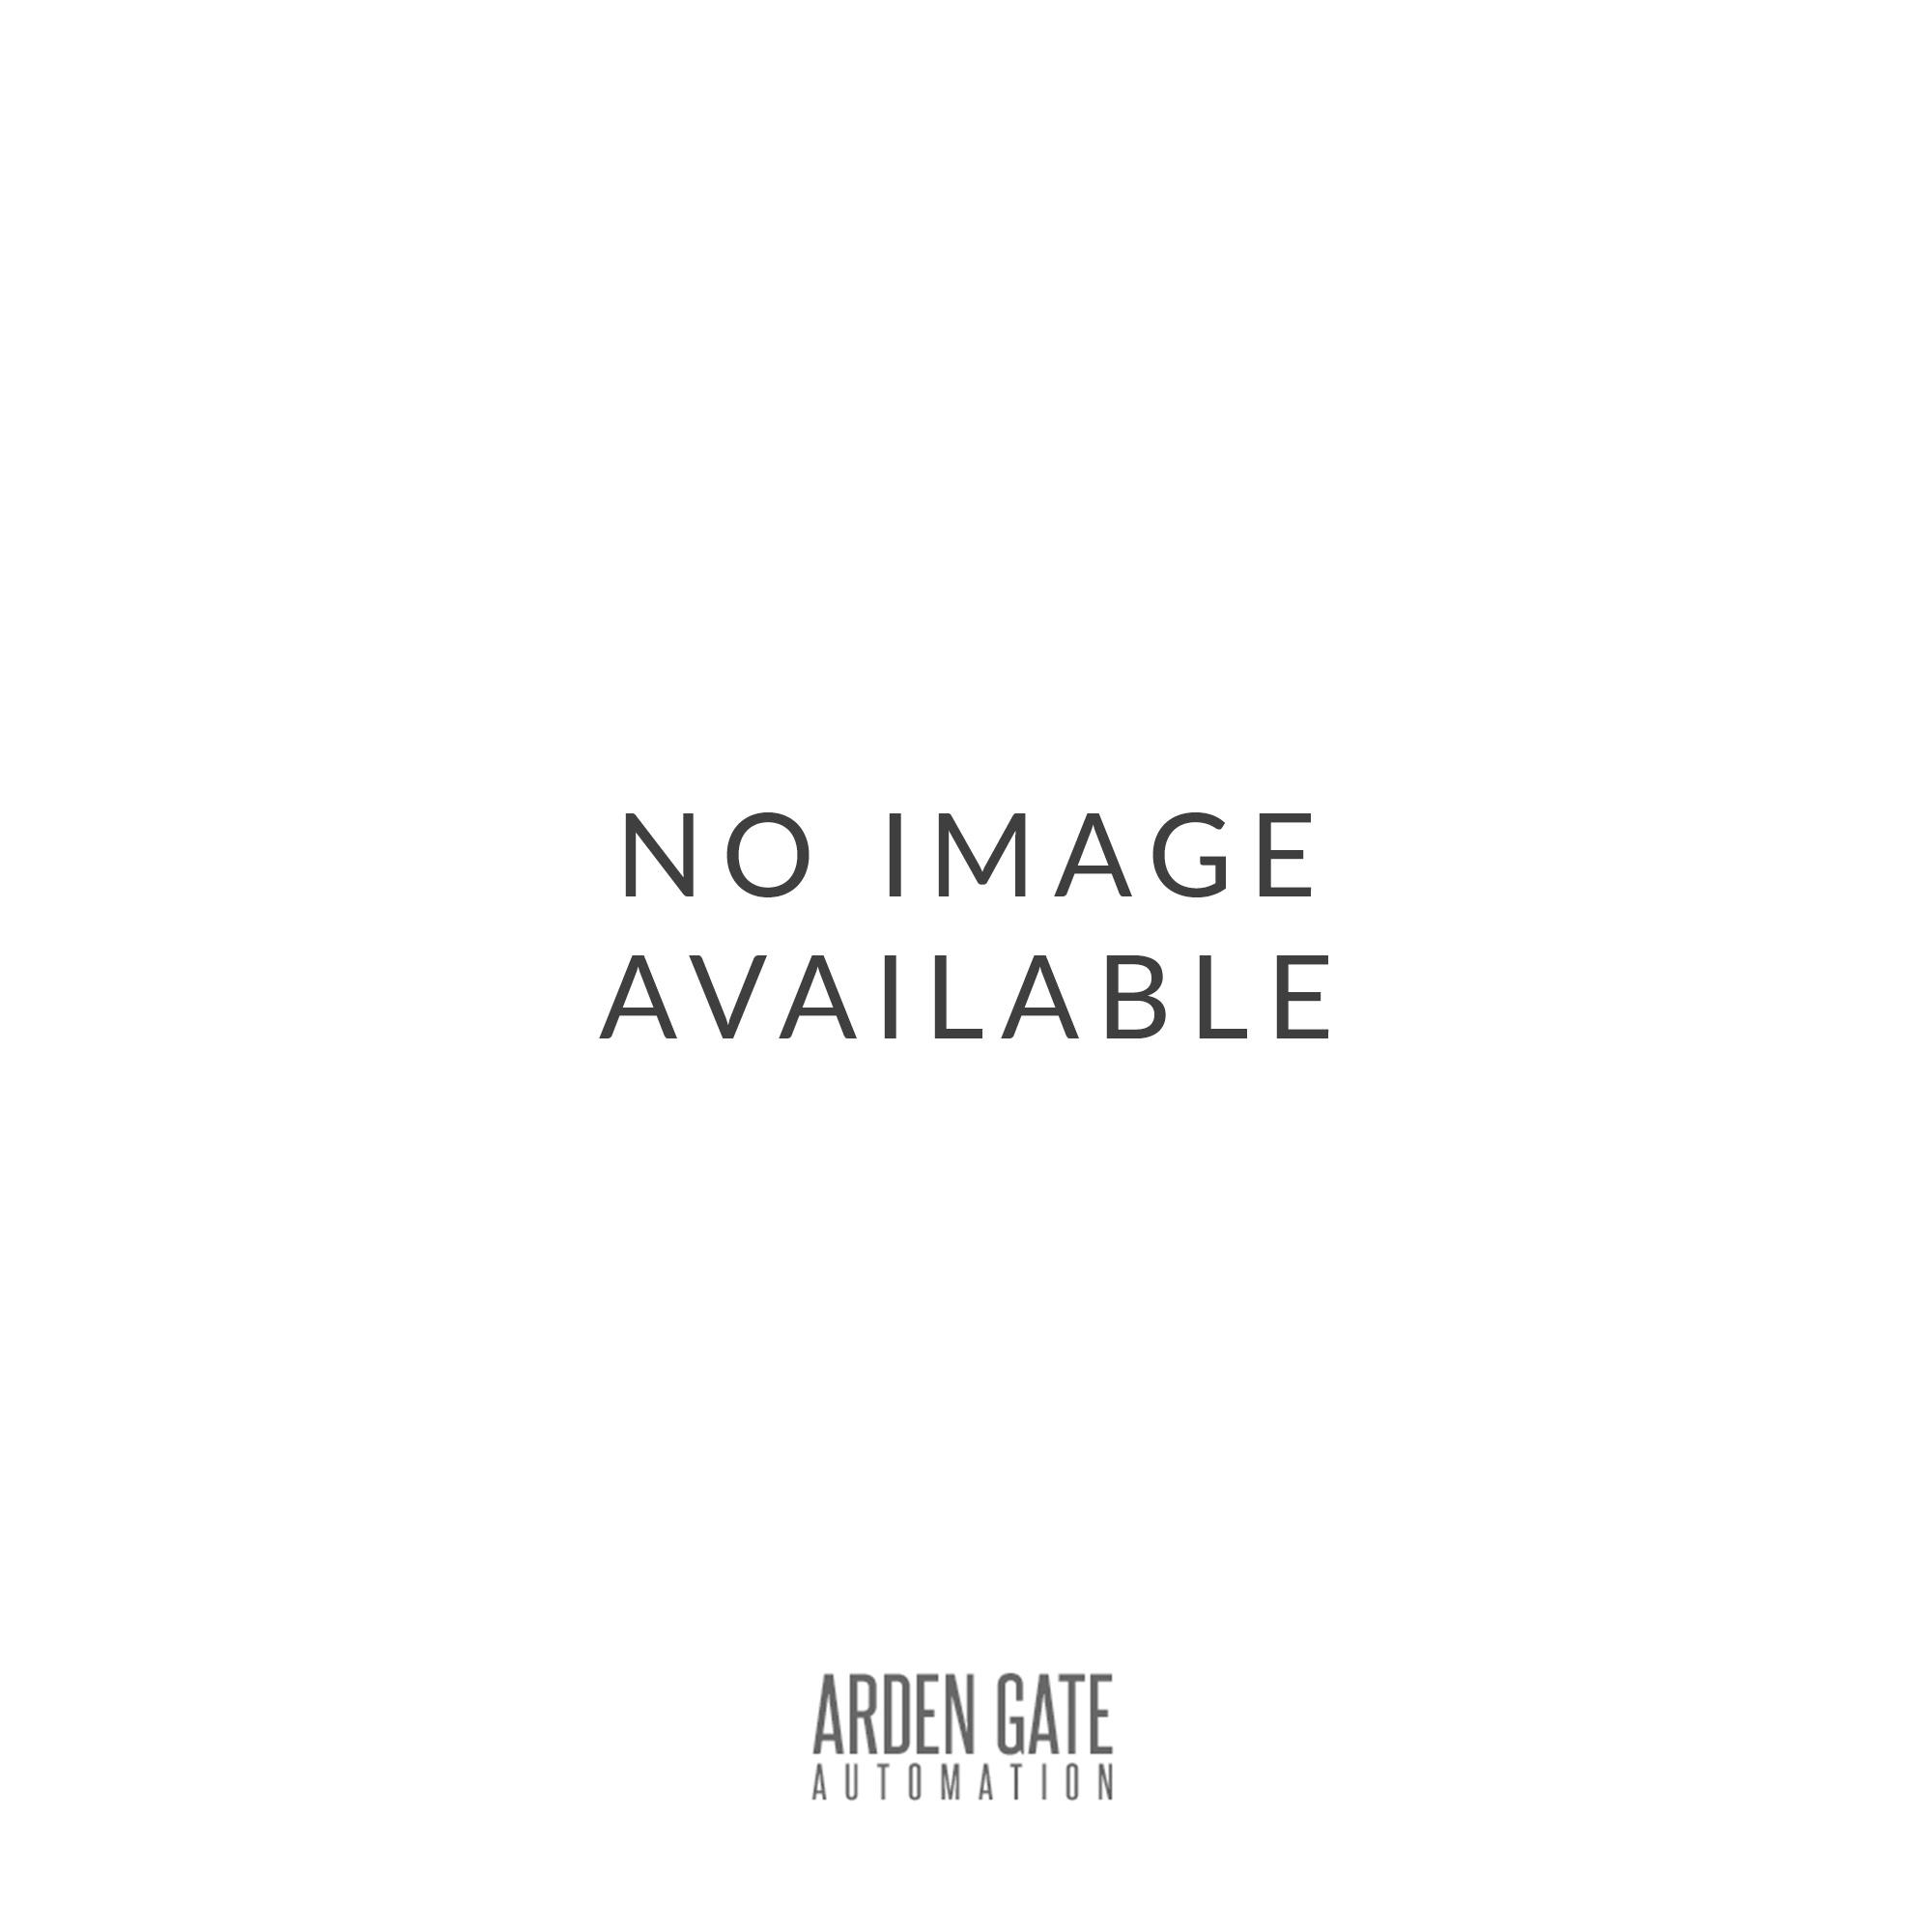 "CDVI 7"" TFT Colour LCD Monitor, Touch Sensitive, White"